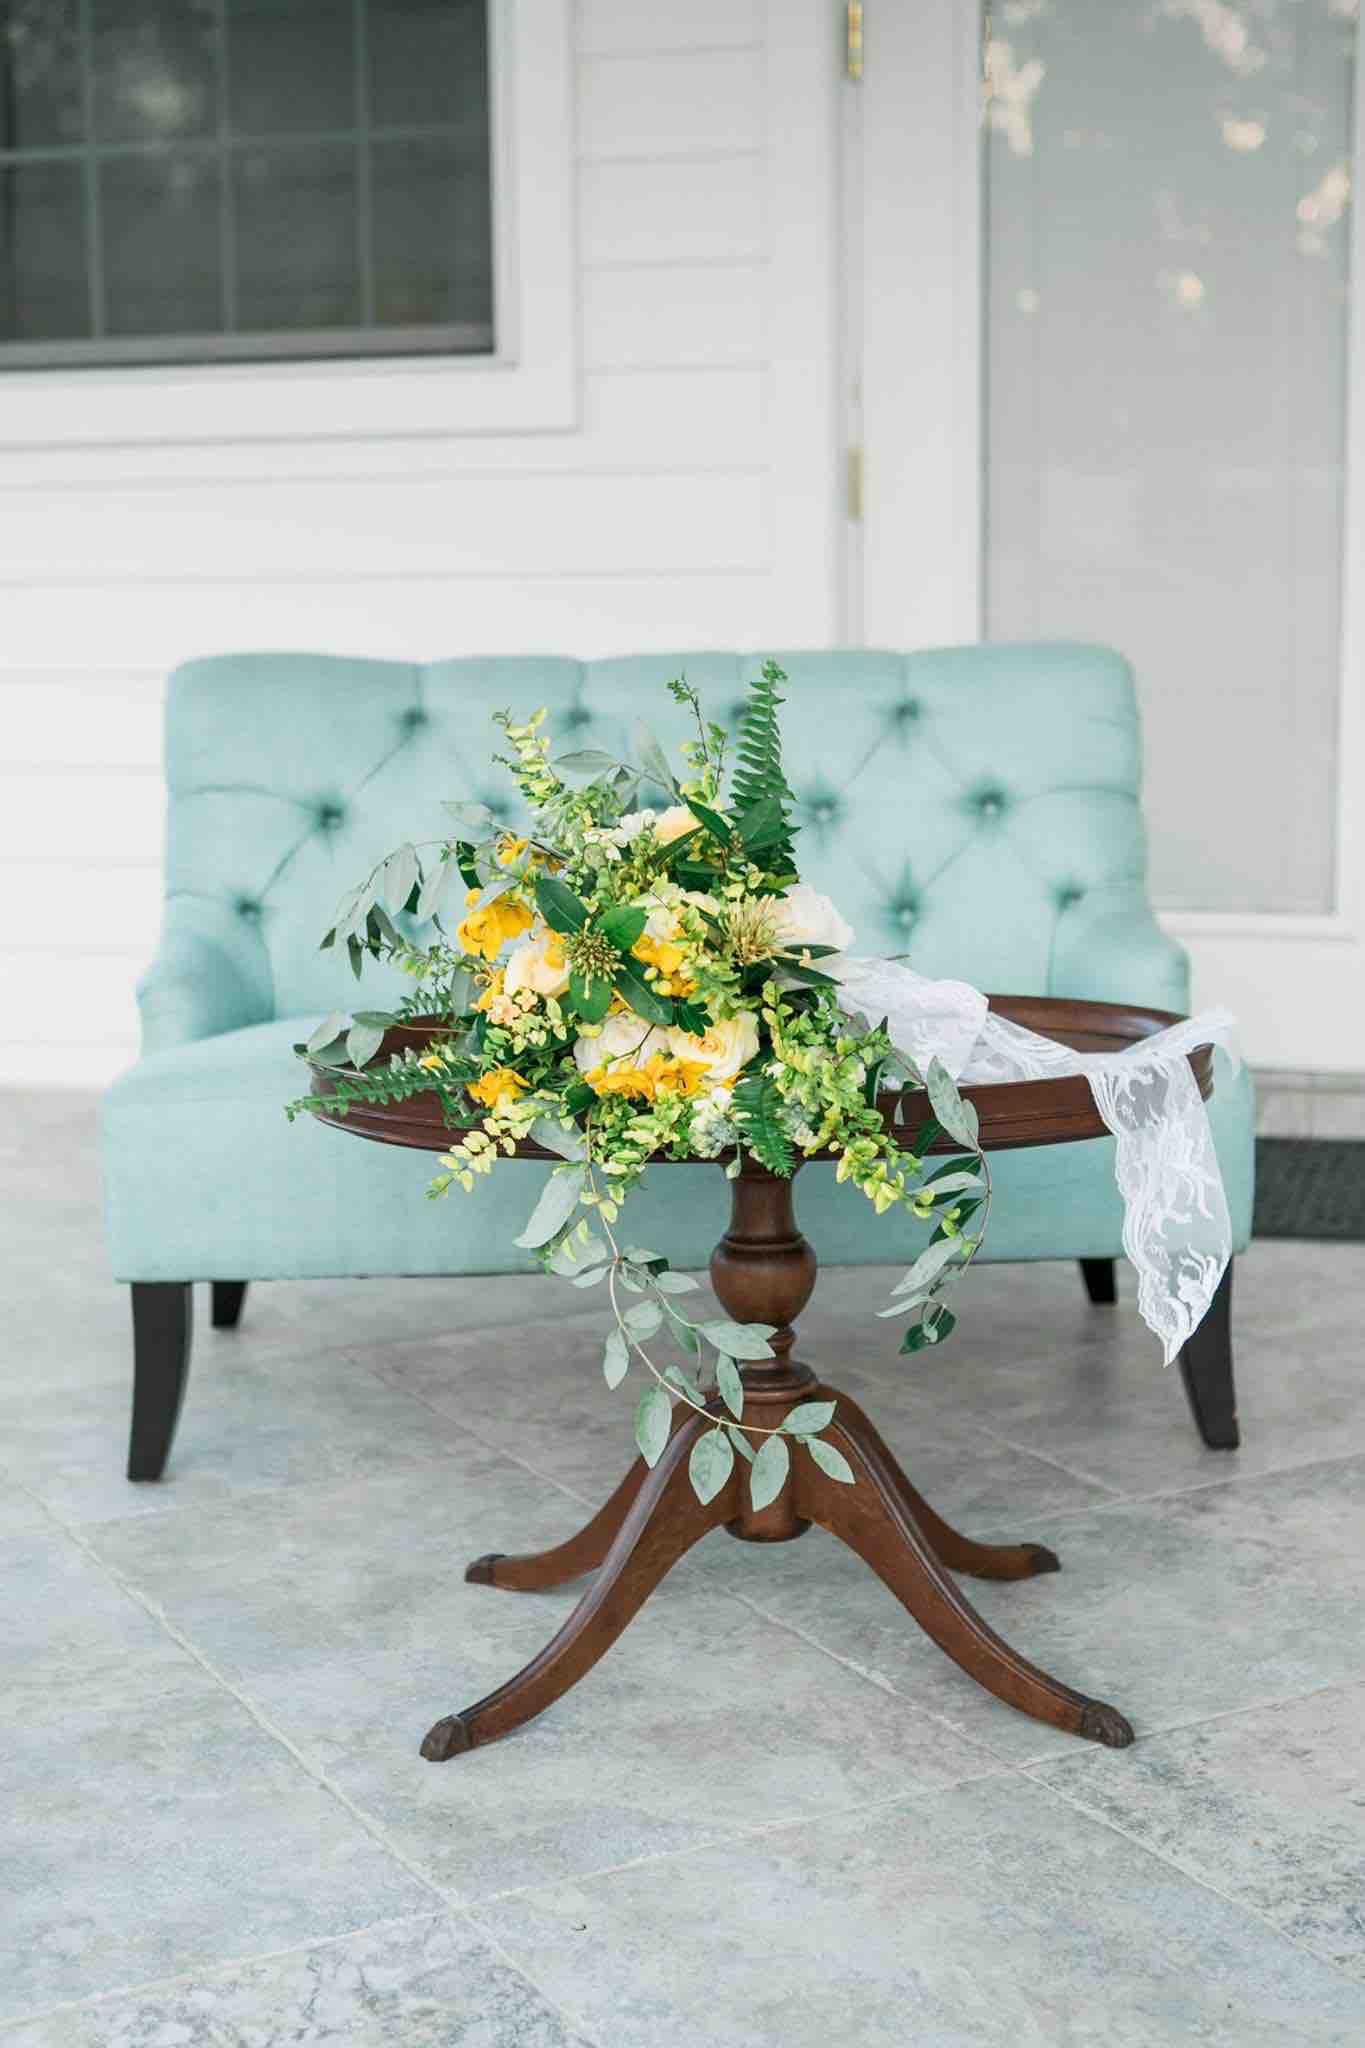 a chair affair gentle yoga arundel estate whimsical photoshoot inc